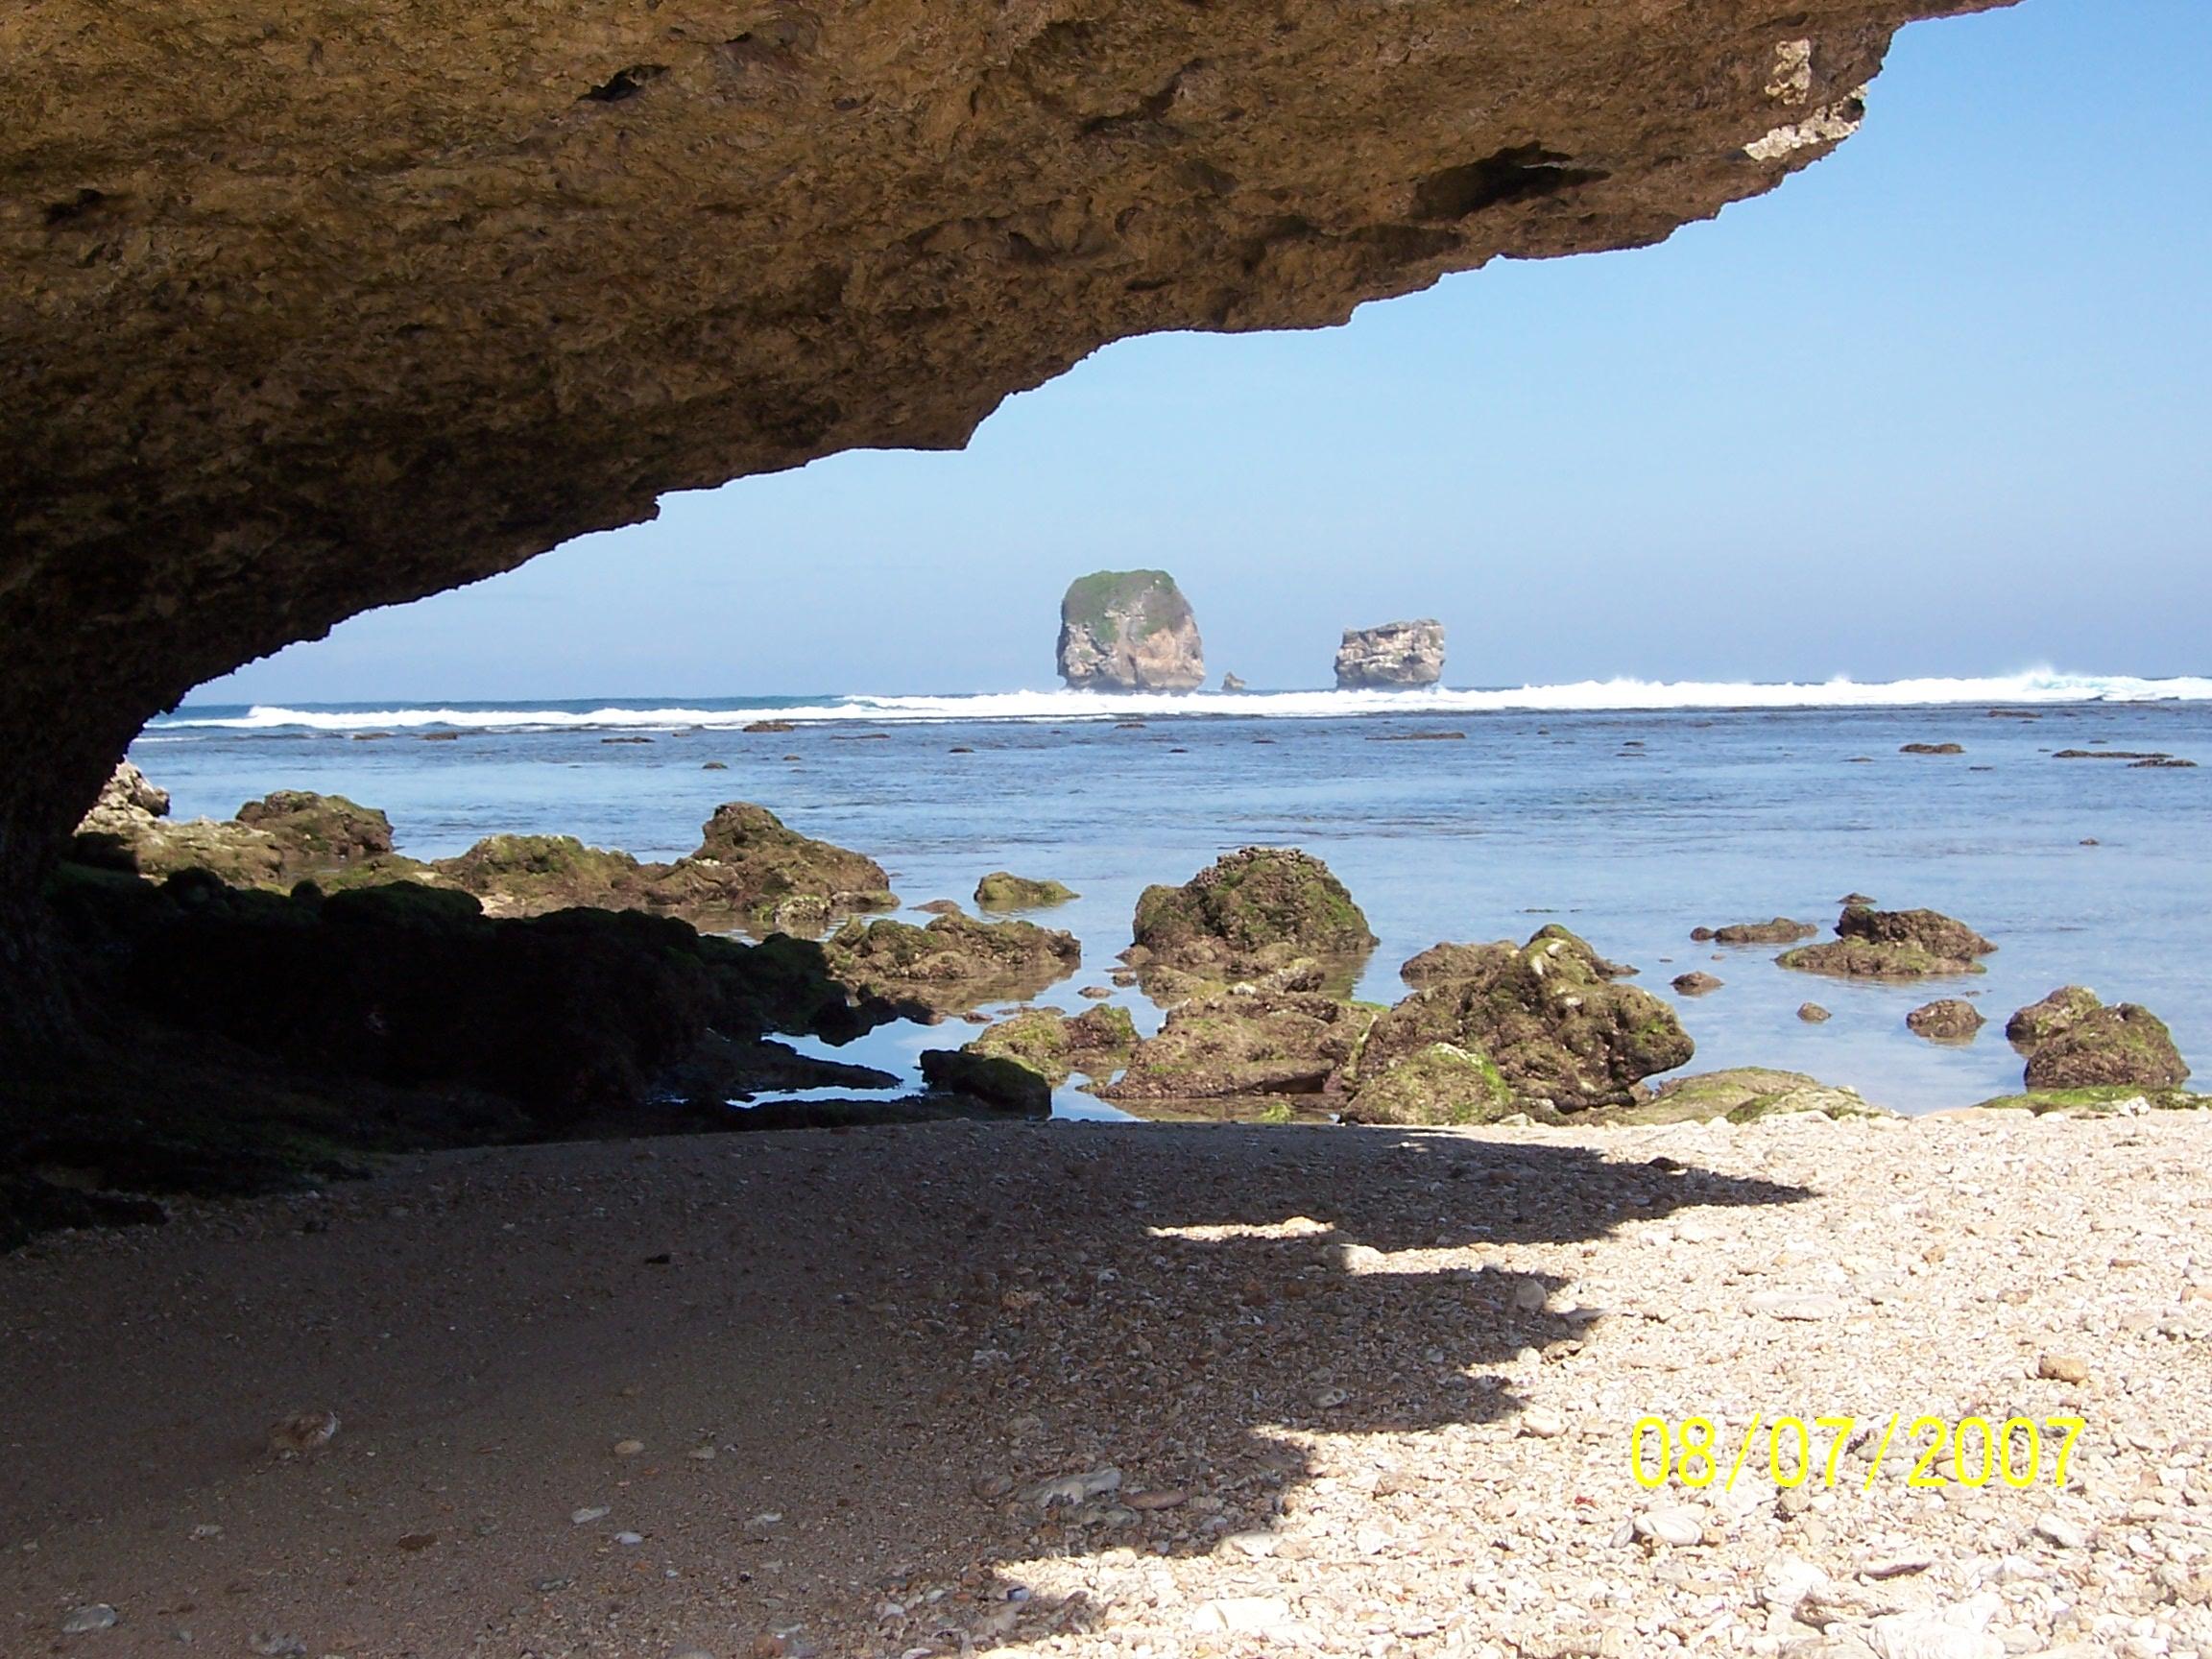 Pariwisata Pantai Portal Pemerintah Kabupaten Malang Goa China Jonggring Saloko